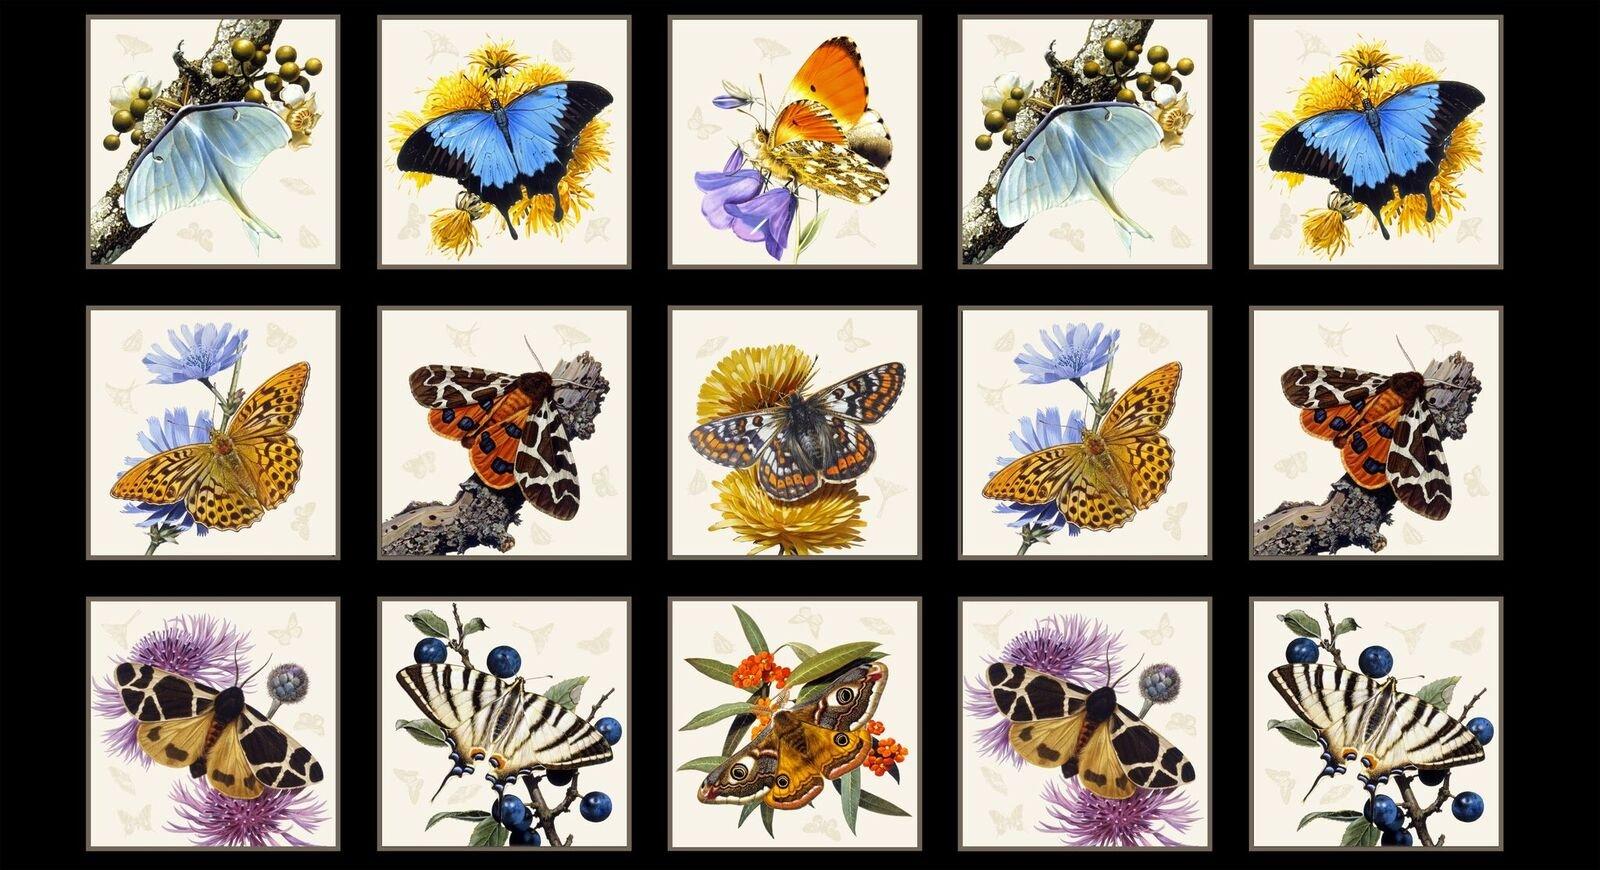 PROMO* ES-Butterflies and Moths 9800 Panel - Black